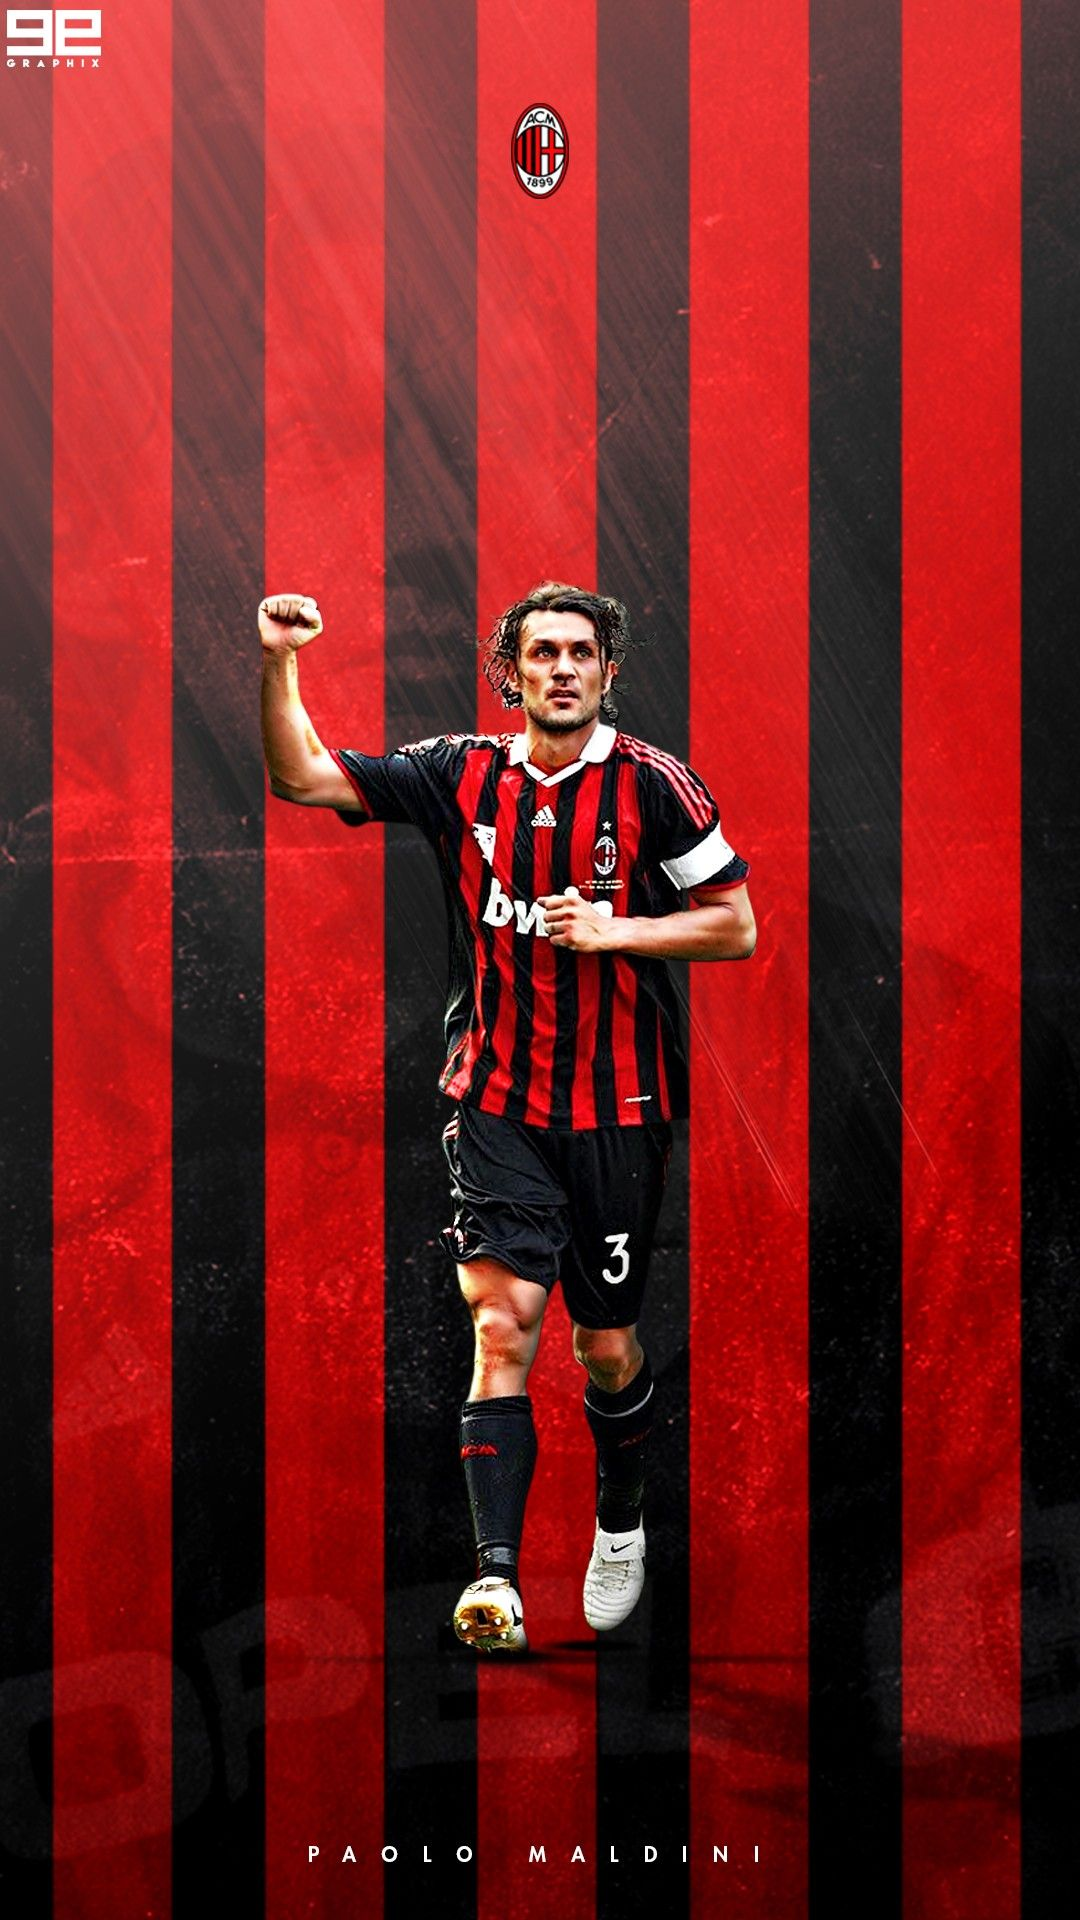 Paolo Maldini Ac Milan Sepak Bola Olahraga